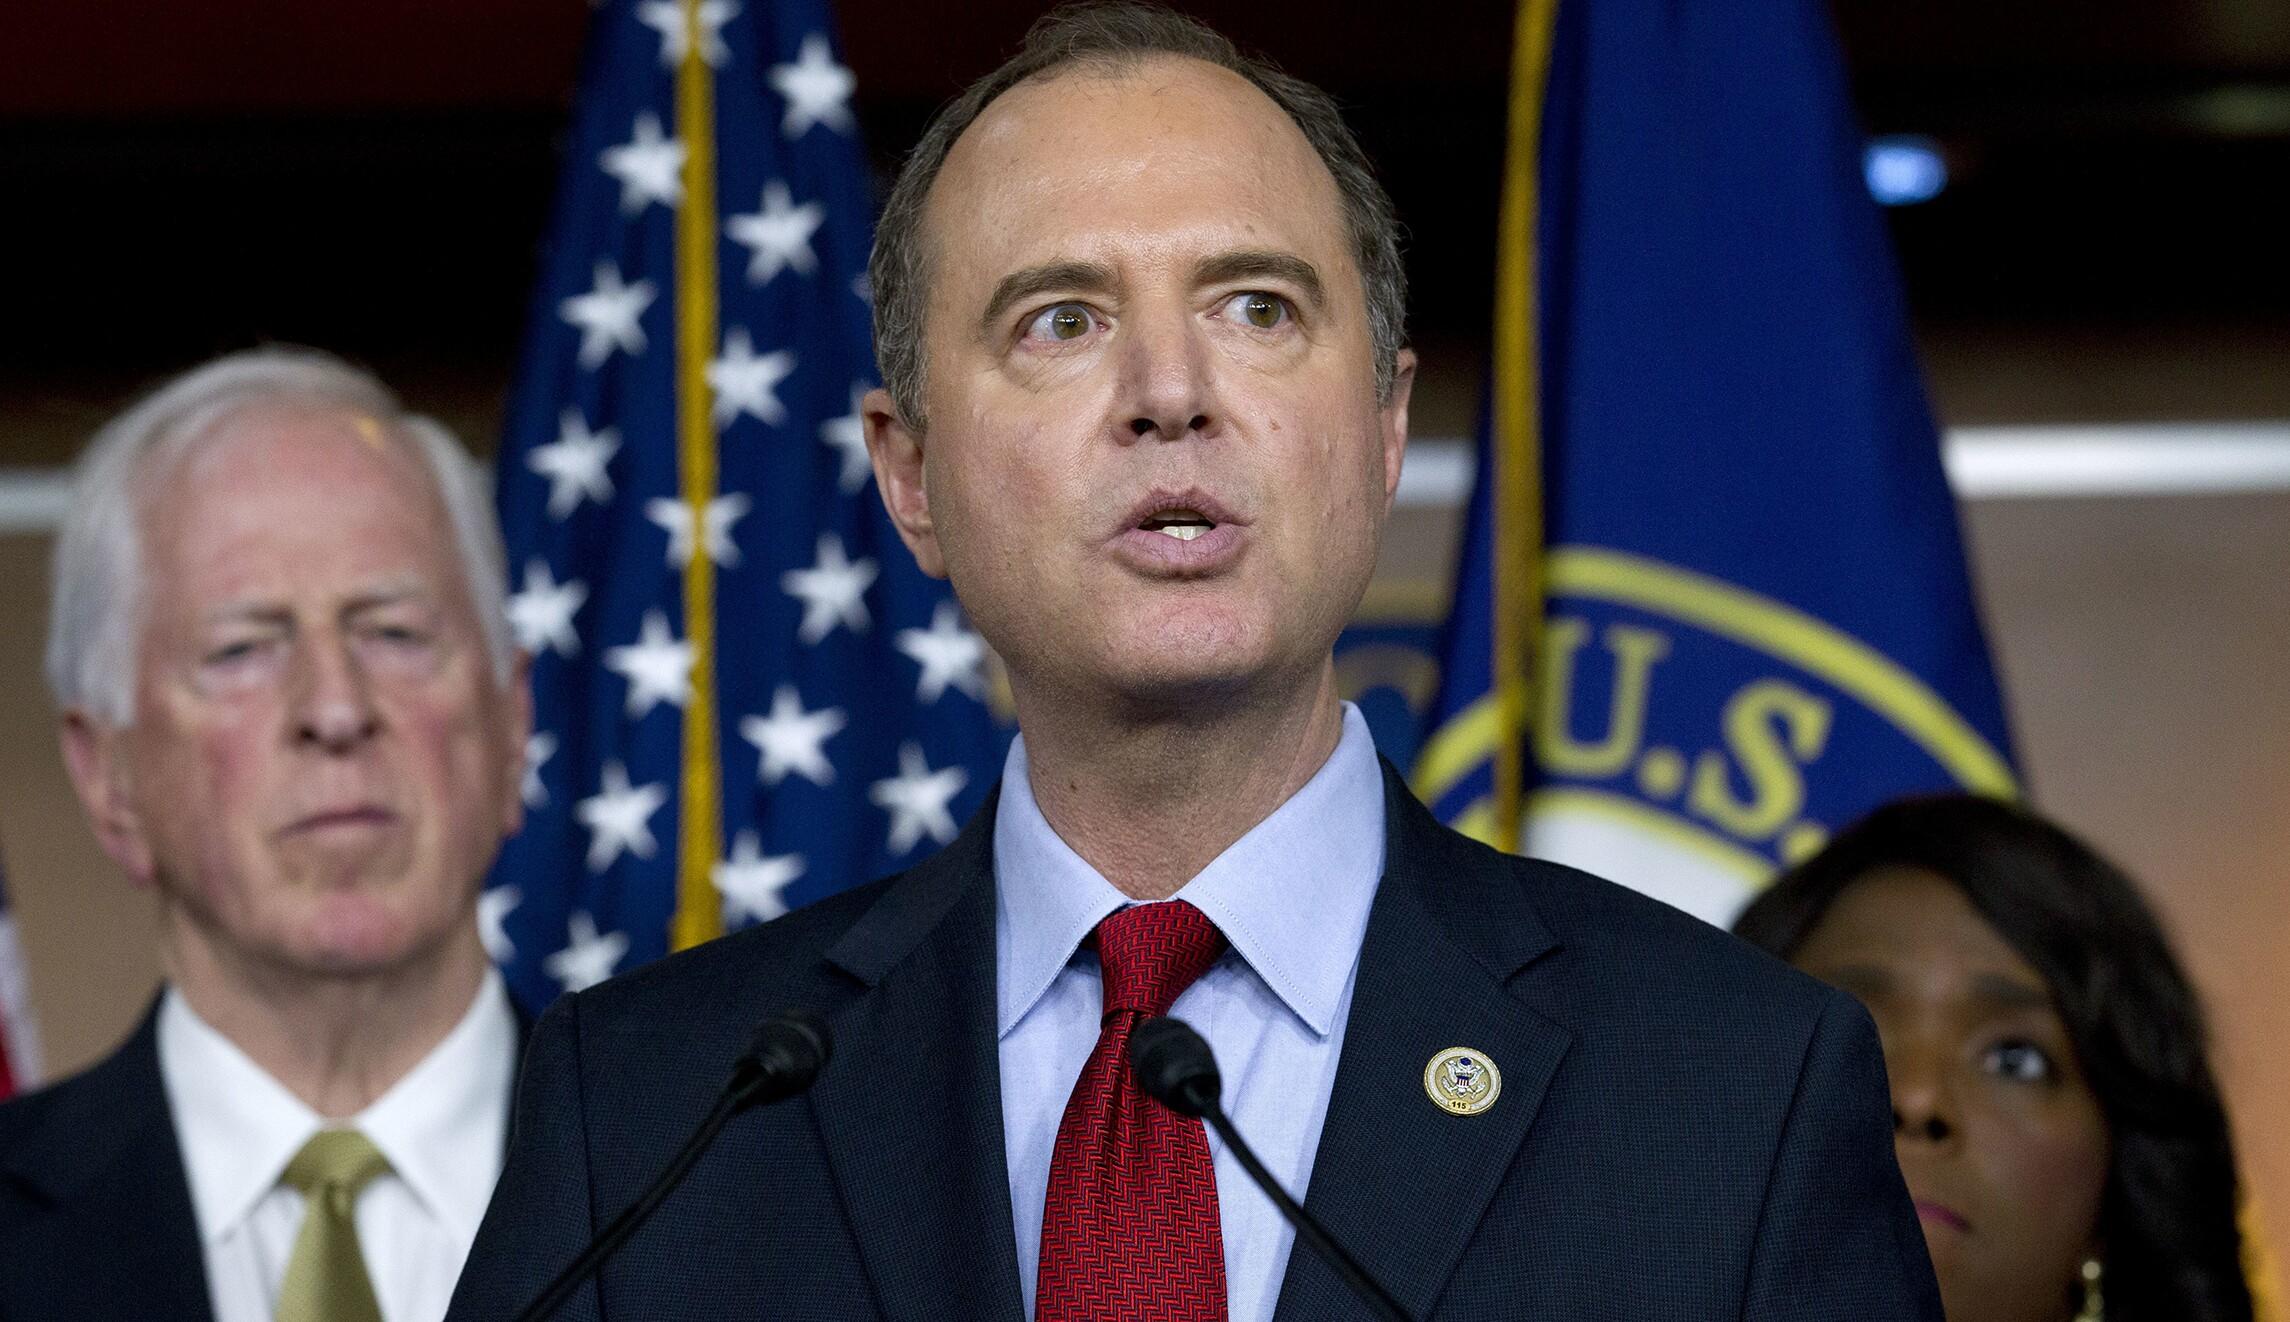 Adam Schiff ducks 'particulars' on mysterious whistleblower complaint